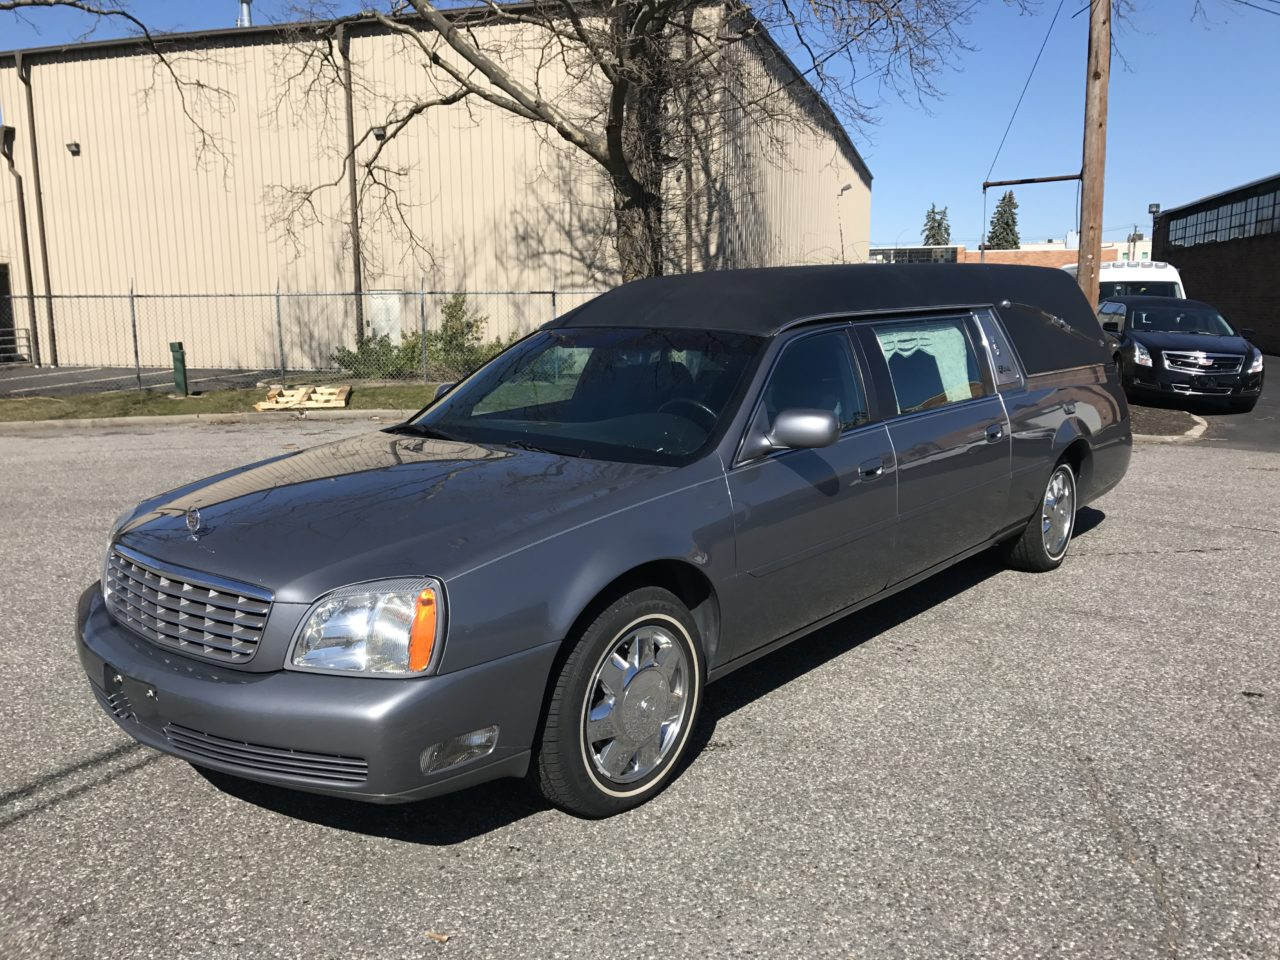 2004 Cadillac Superior Statesman Used Funeral Hearse